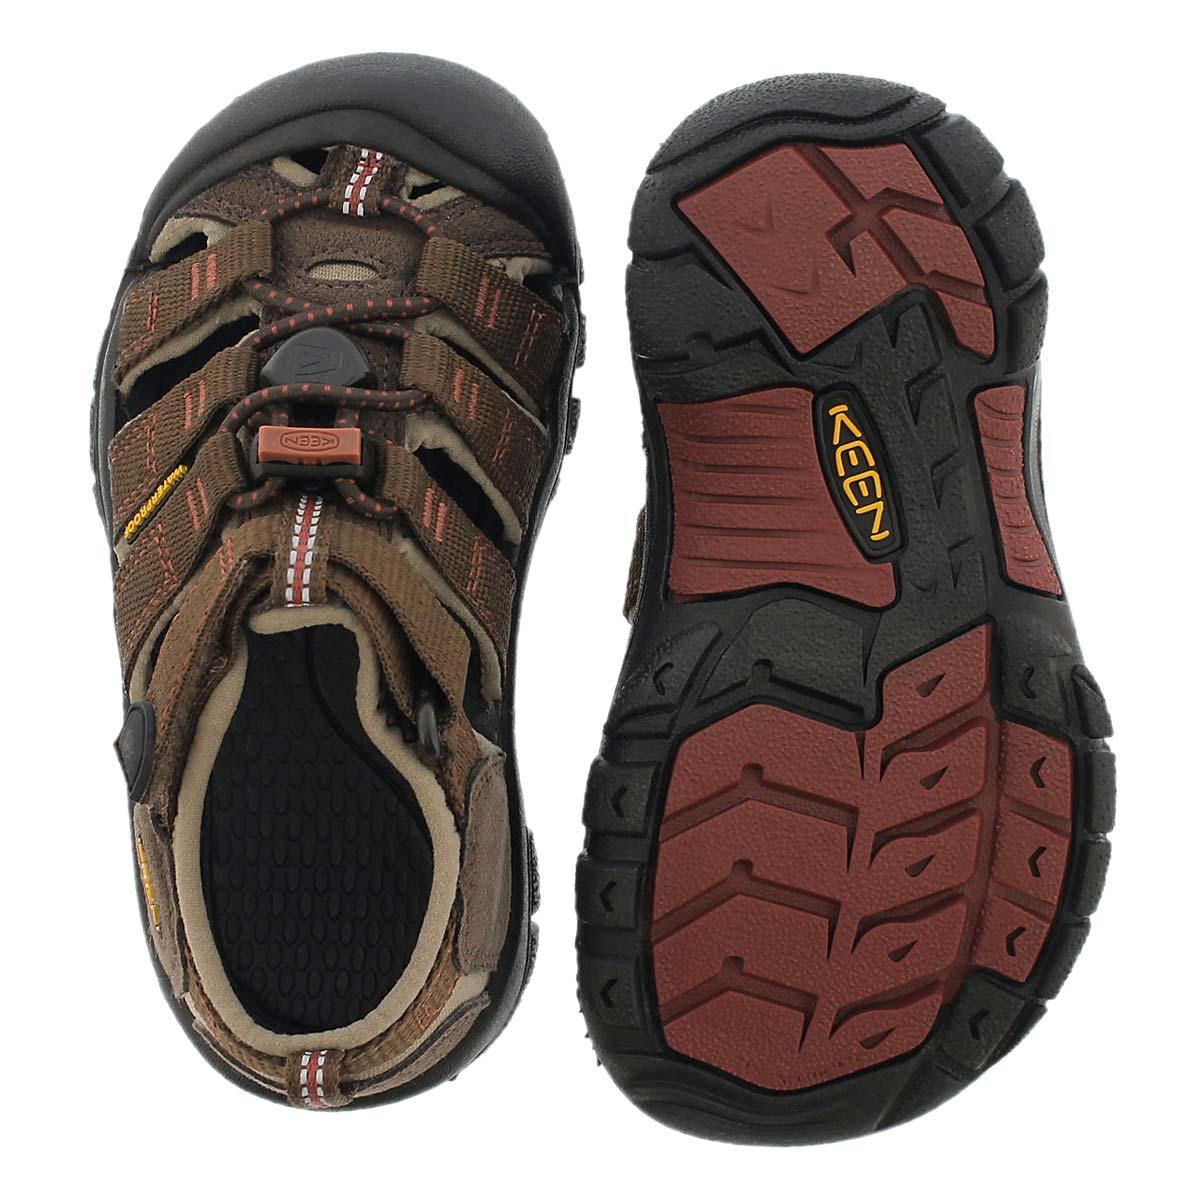 Inf Newport H2 Classi henna/black sandal